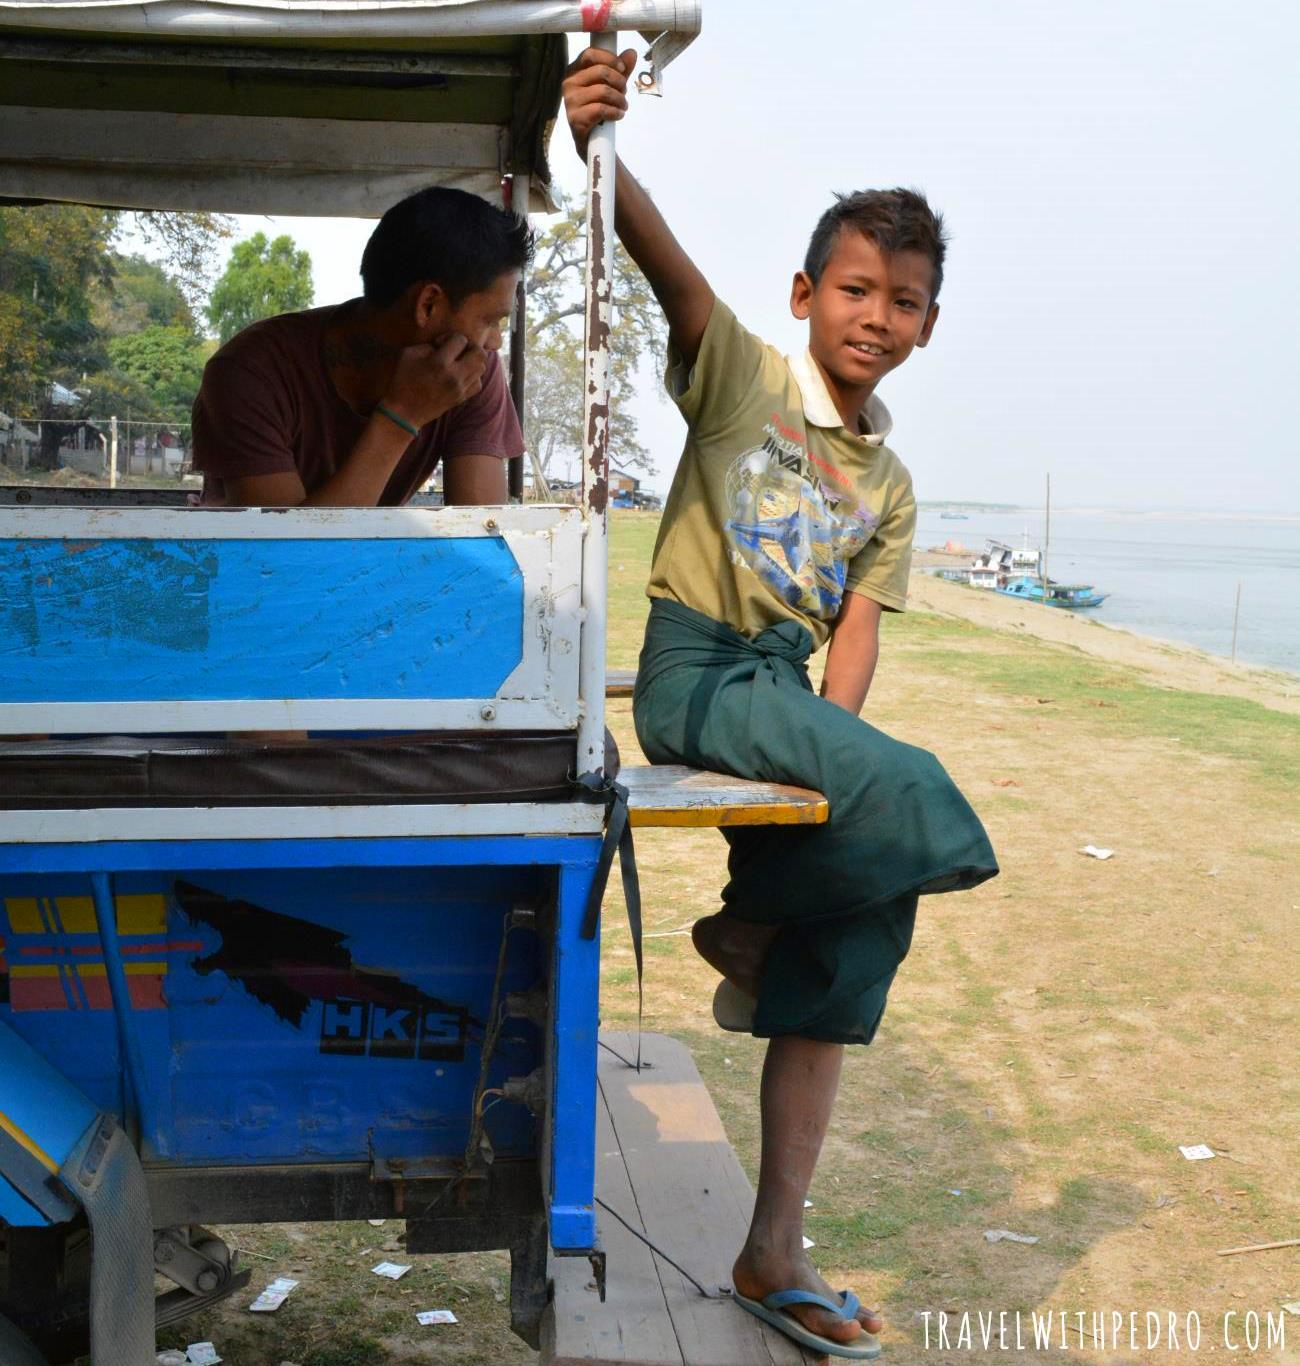 Povo de Myanmar: Visitando o Templo de Mingun